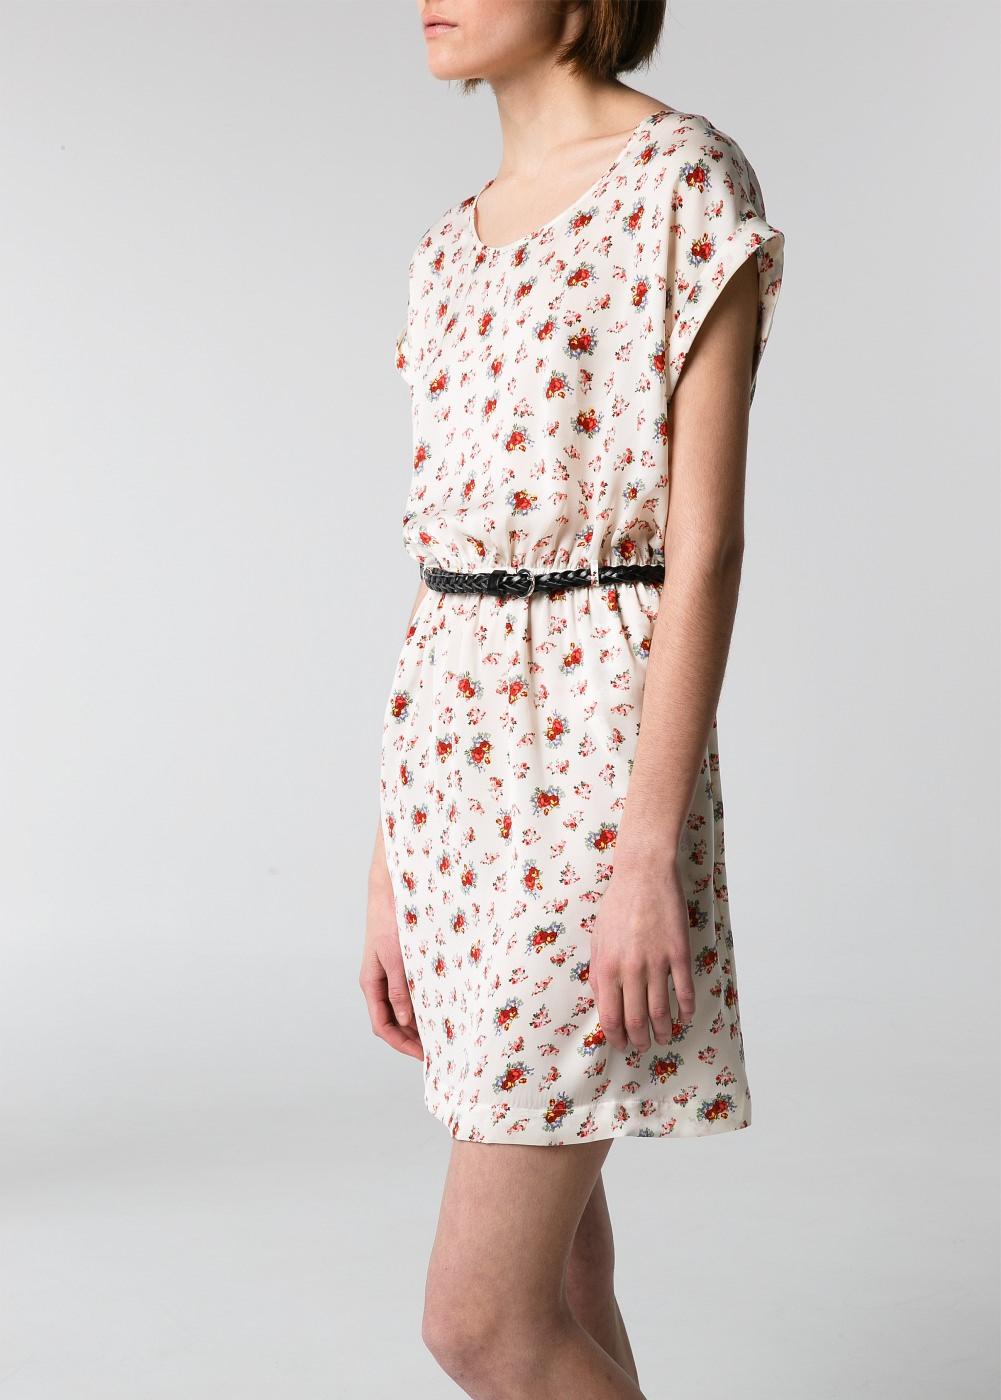 Belted printed dress -  Dresses - Women - MANGO